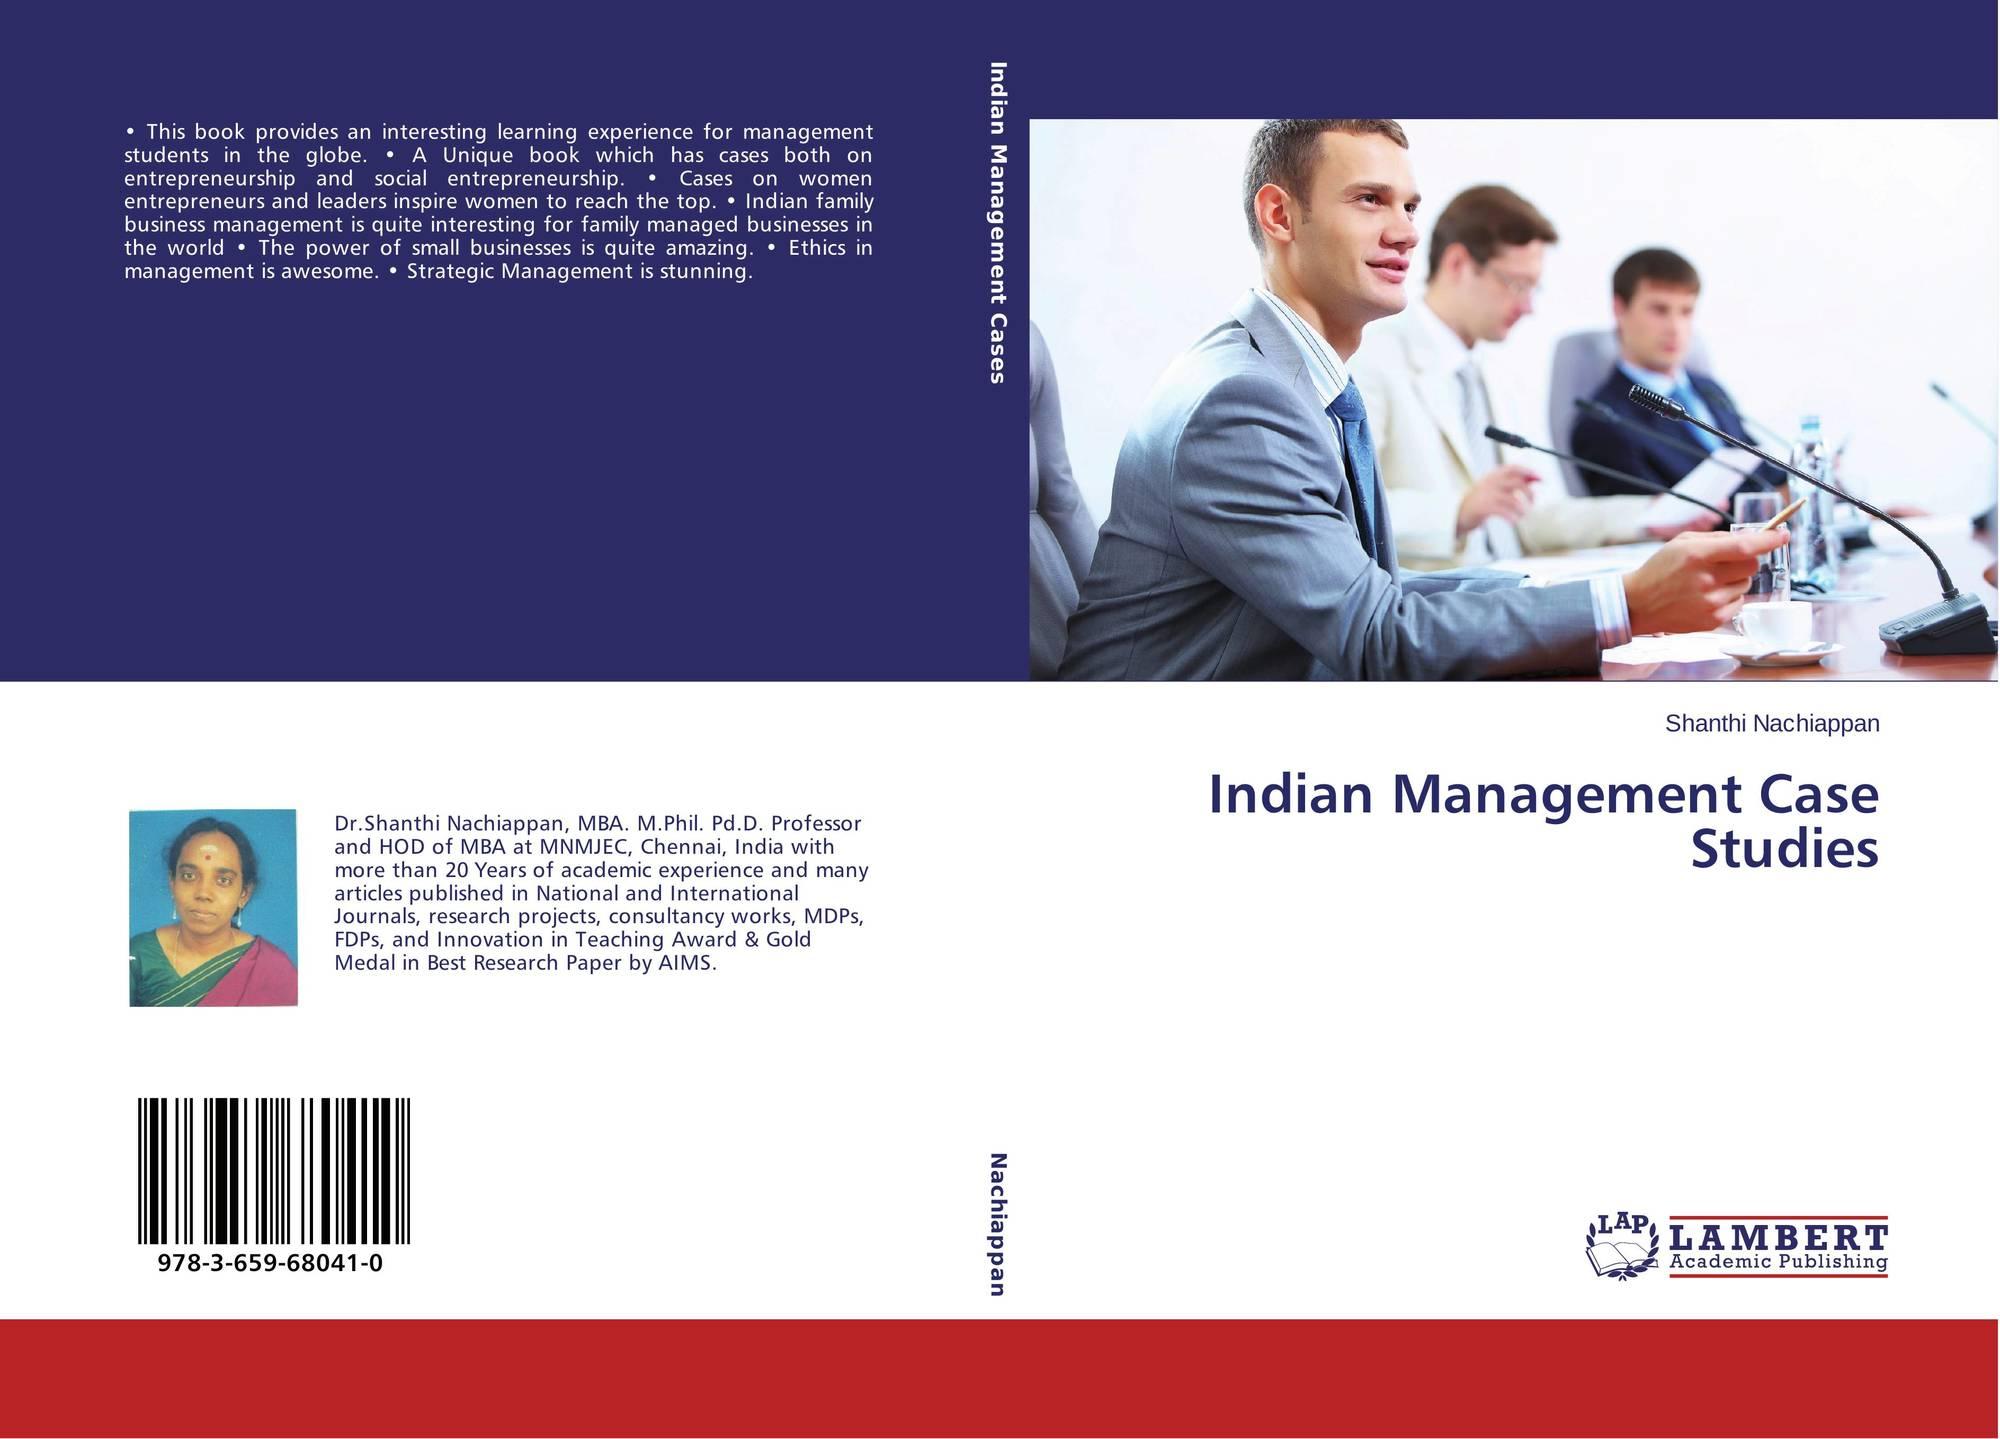 Indian Management Case Studies, 978-3-659-68041-0